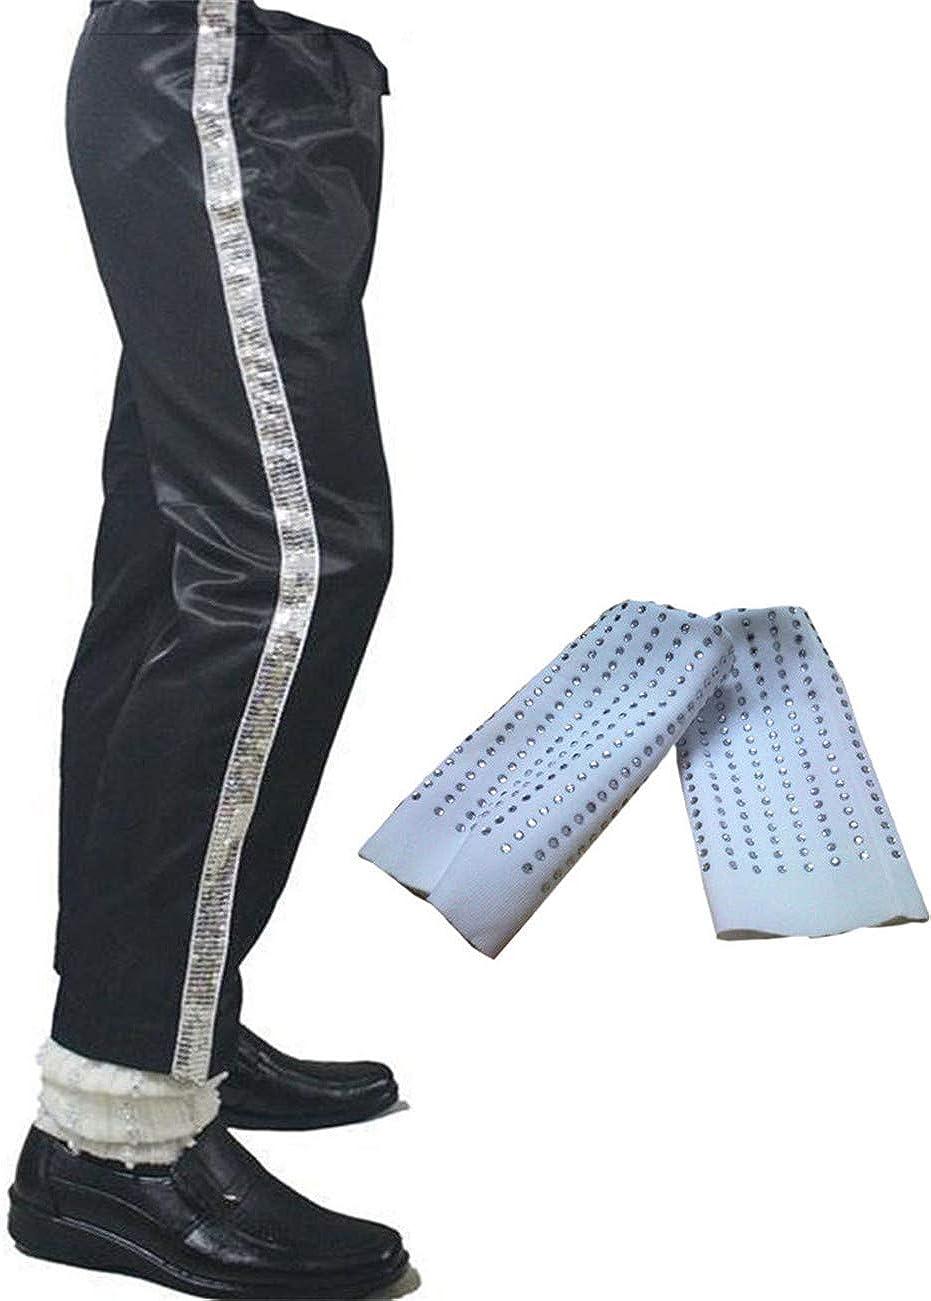 Shuanghao Halloween Cosplay Costume Adatto per i Fan di Michael Jackso Cosplay 4 Pezzi MJ Billie Jeans Jacket Pant Socks Glove